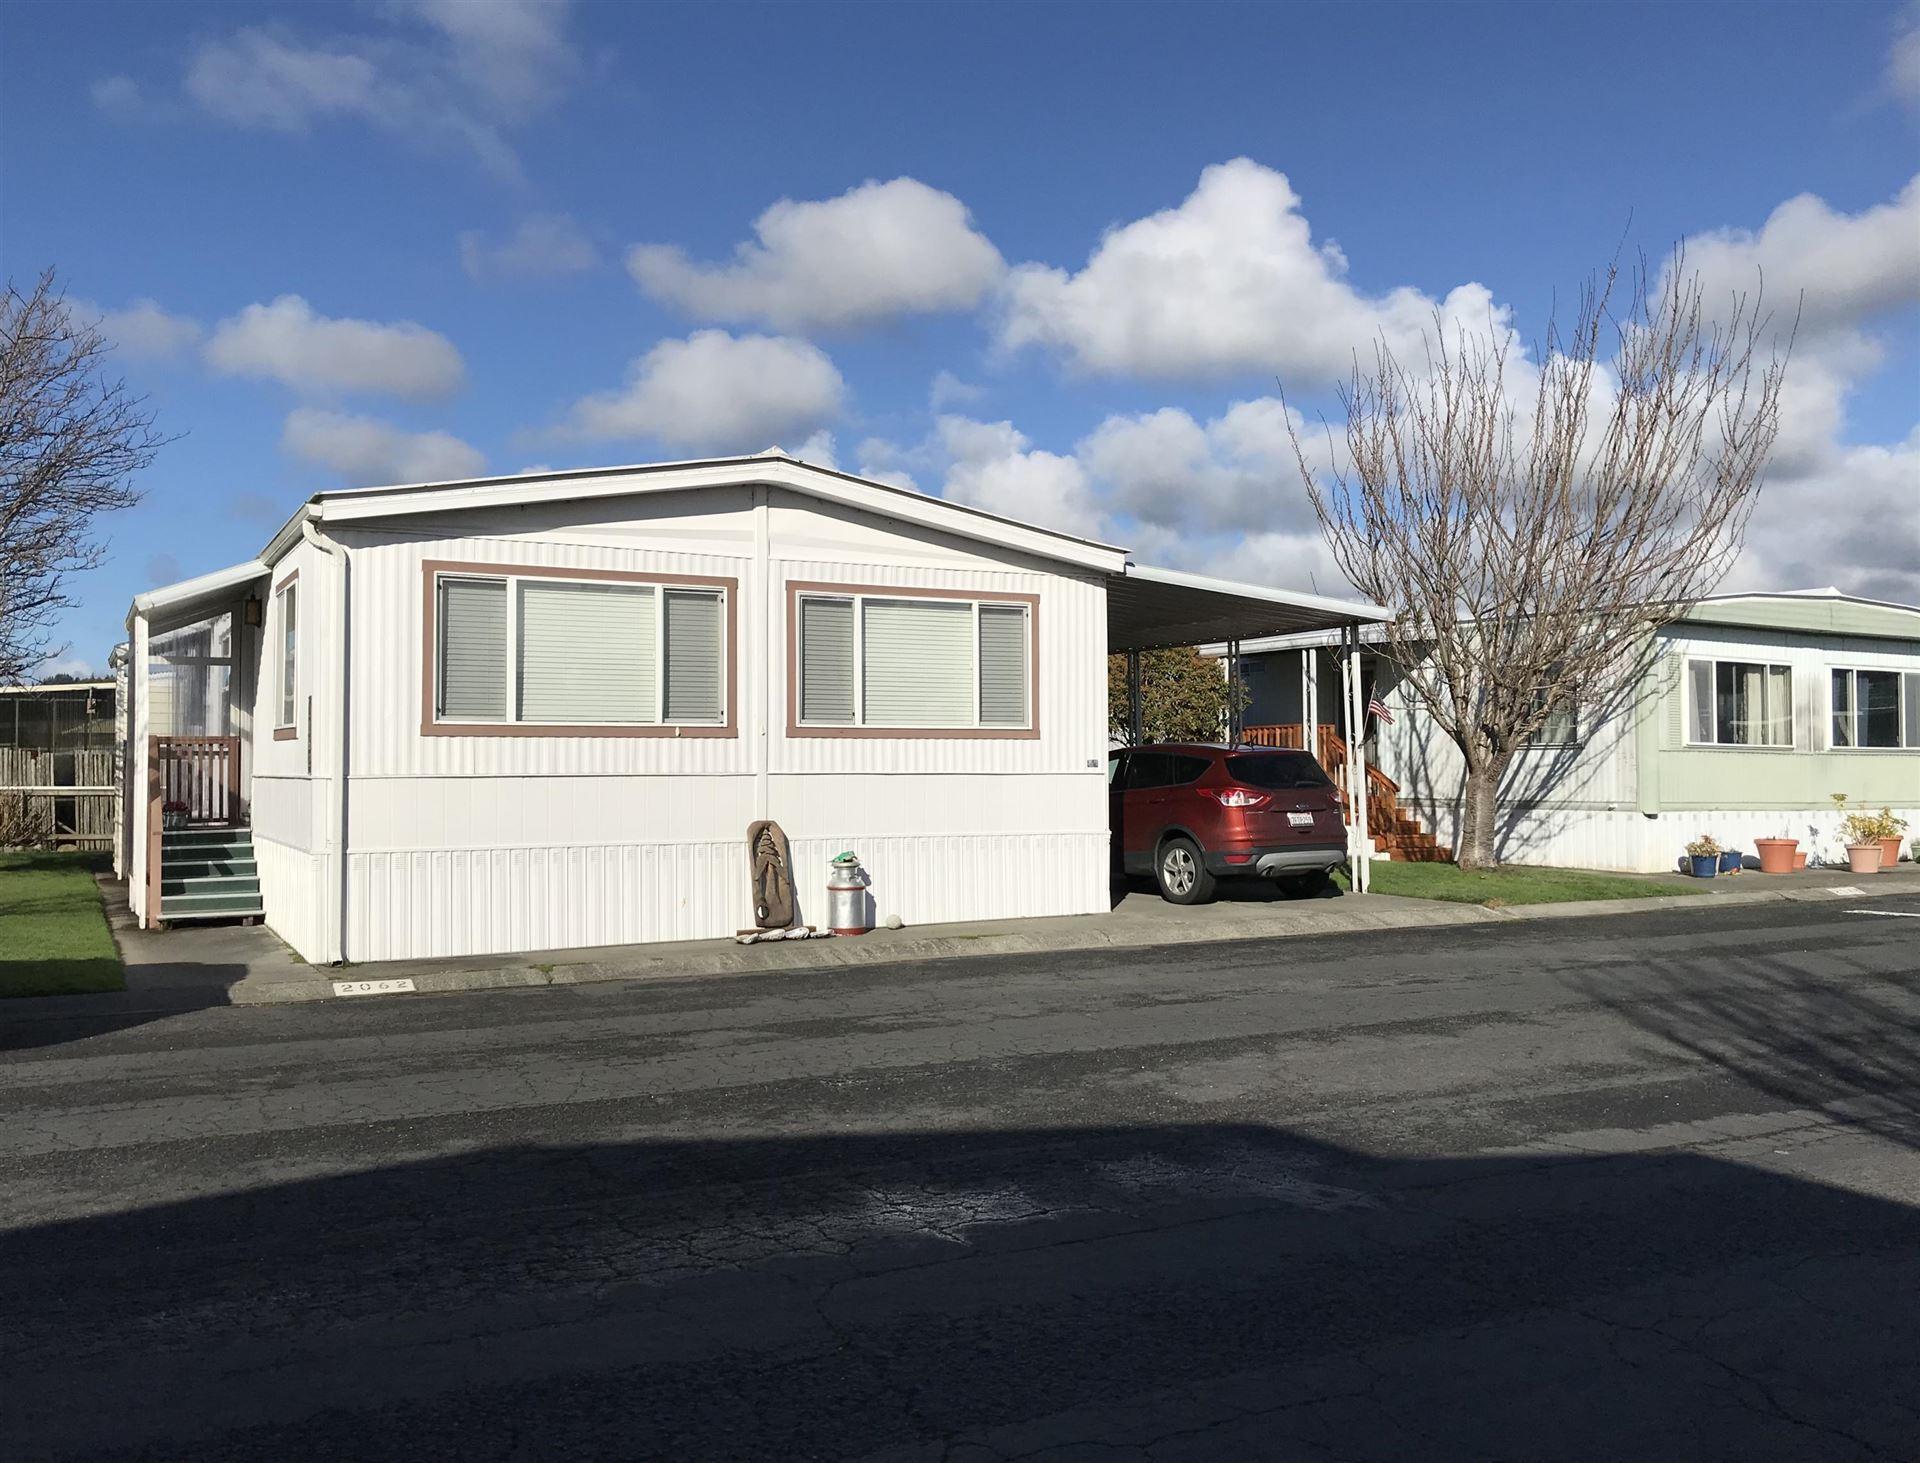 2062 Appaloosa Lane, Arcata, CA 95521 - MLS#: 258411